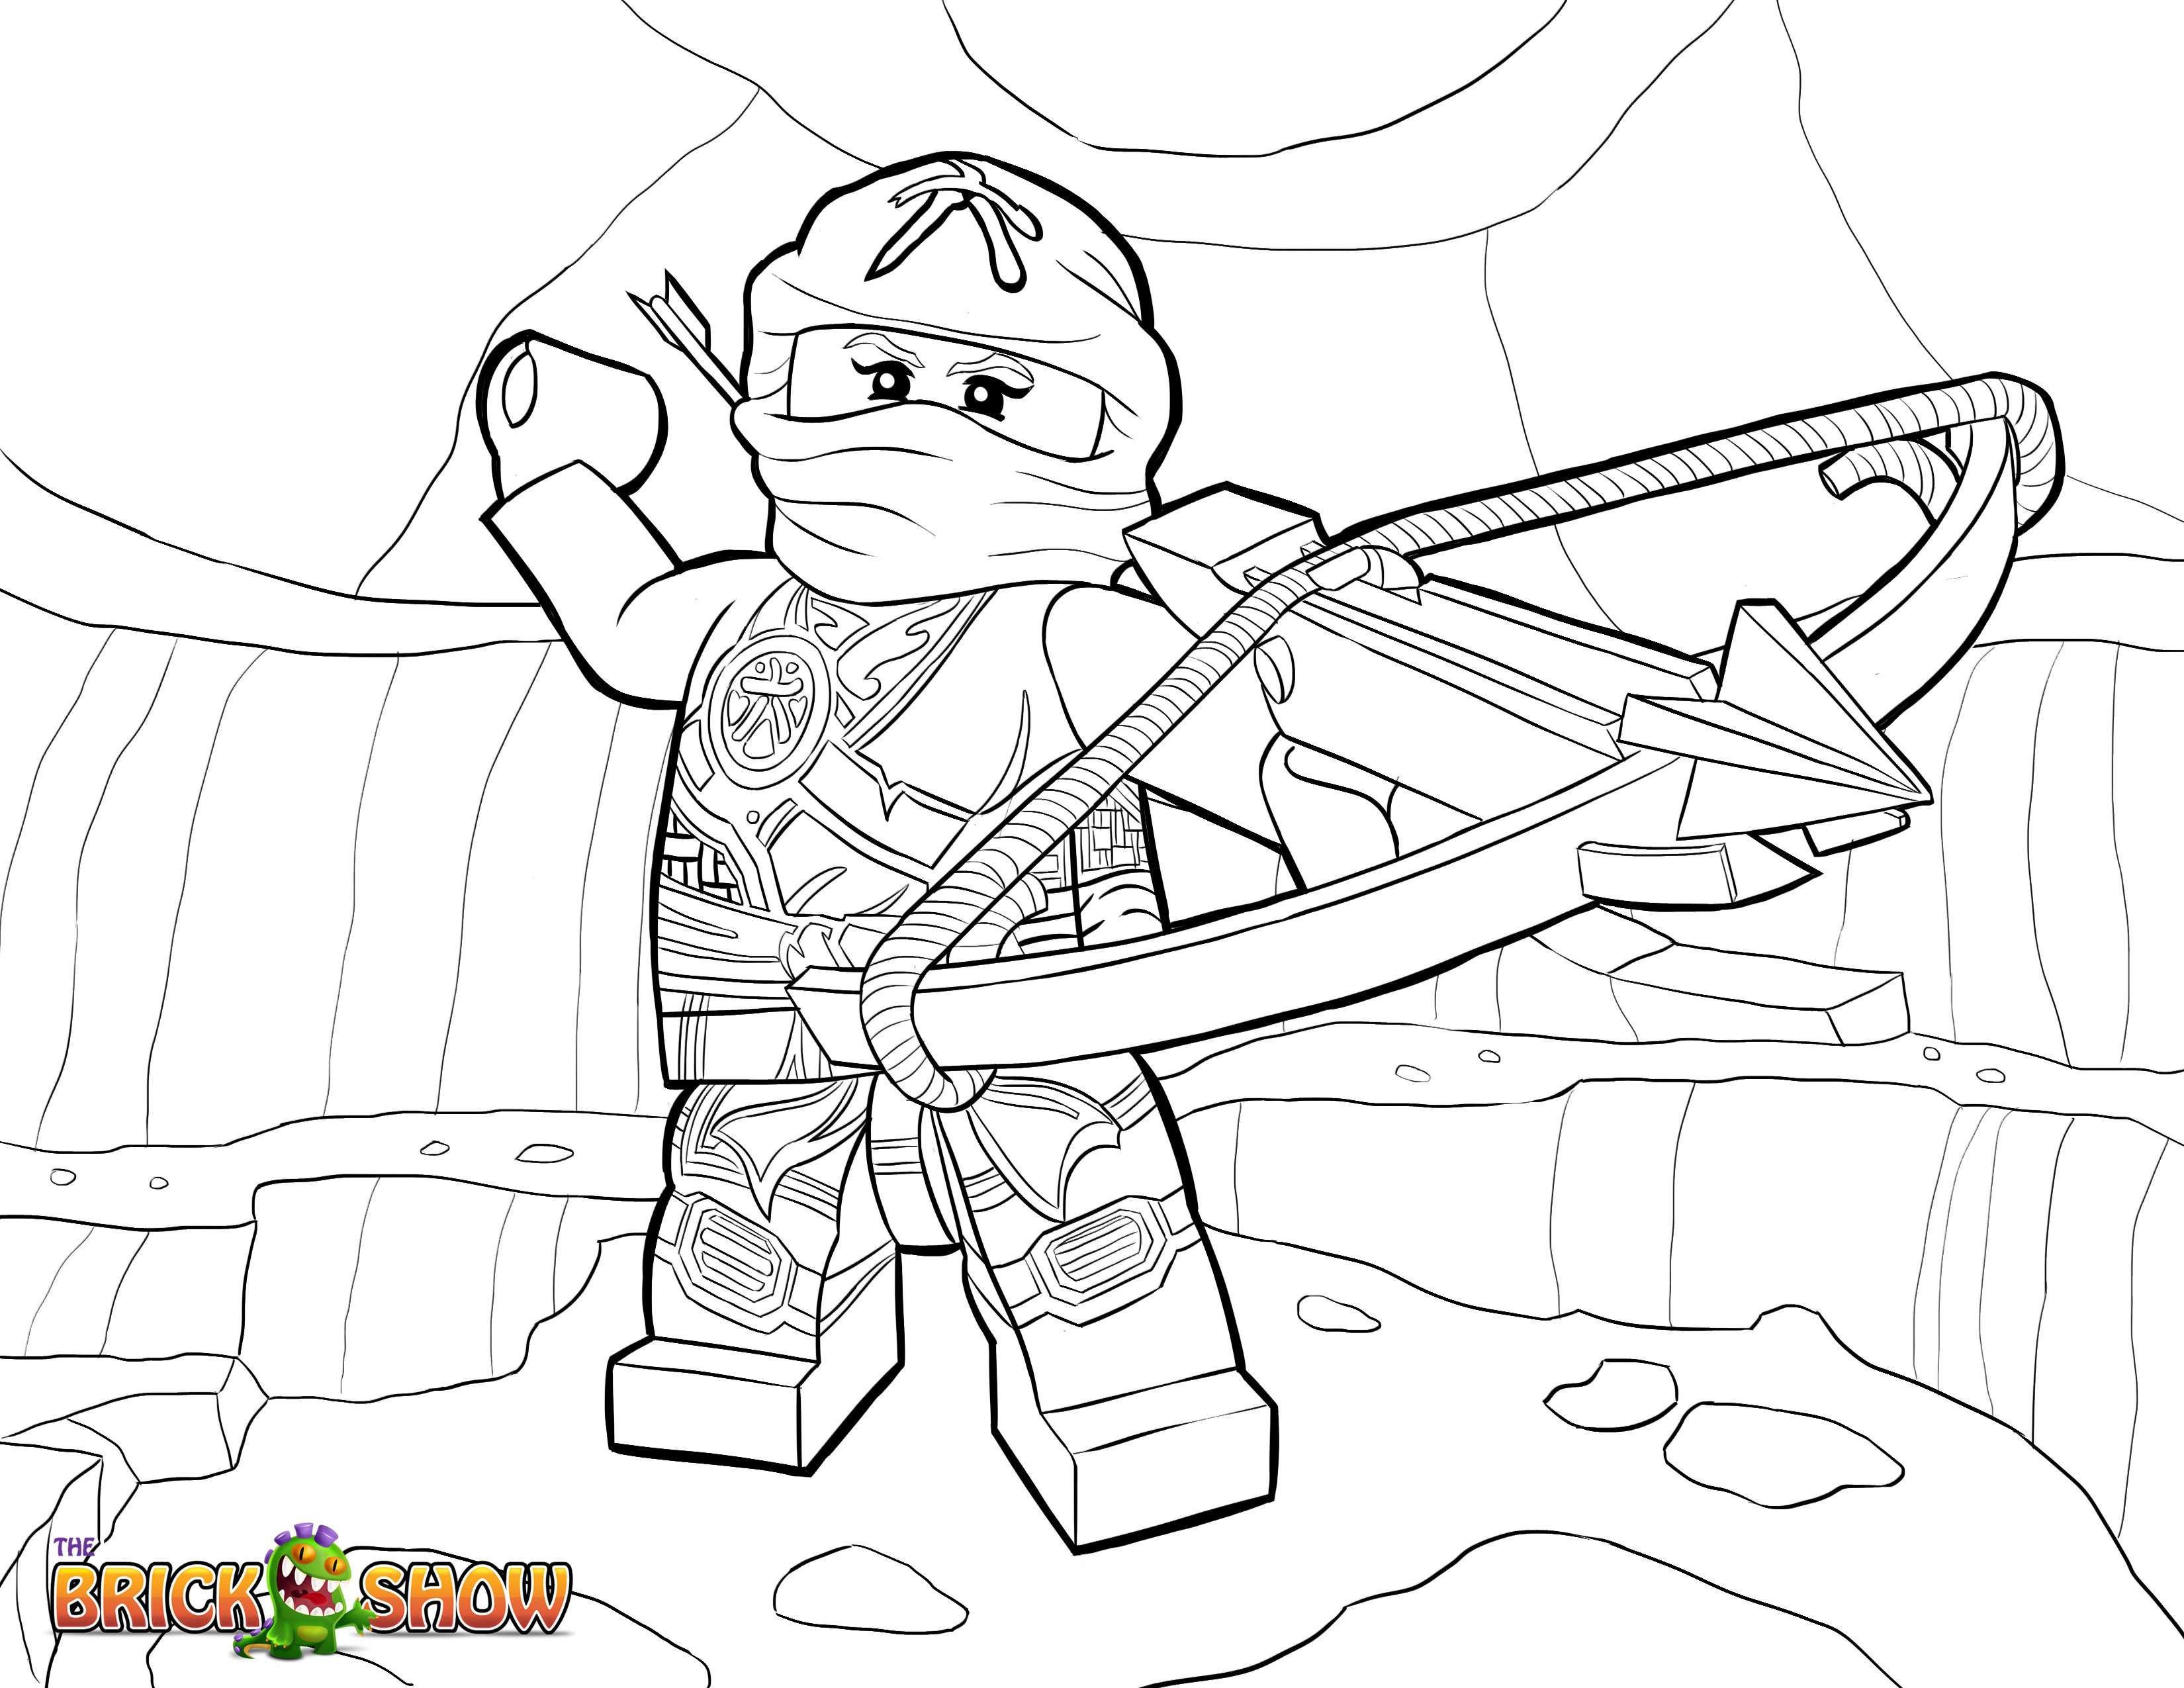 The Legend Of Zelda Ausmalbilder Das Beste Von 38 Coloring Pages for Boys Lego Ninjago Printable Schön Ninjago Stock